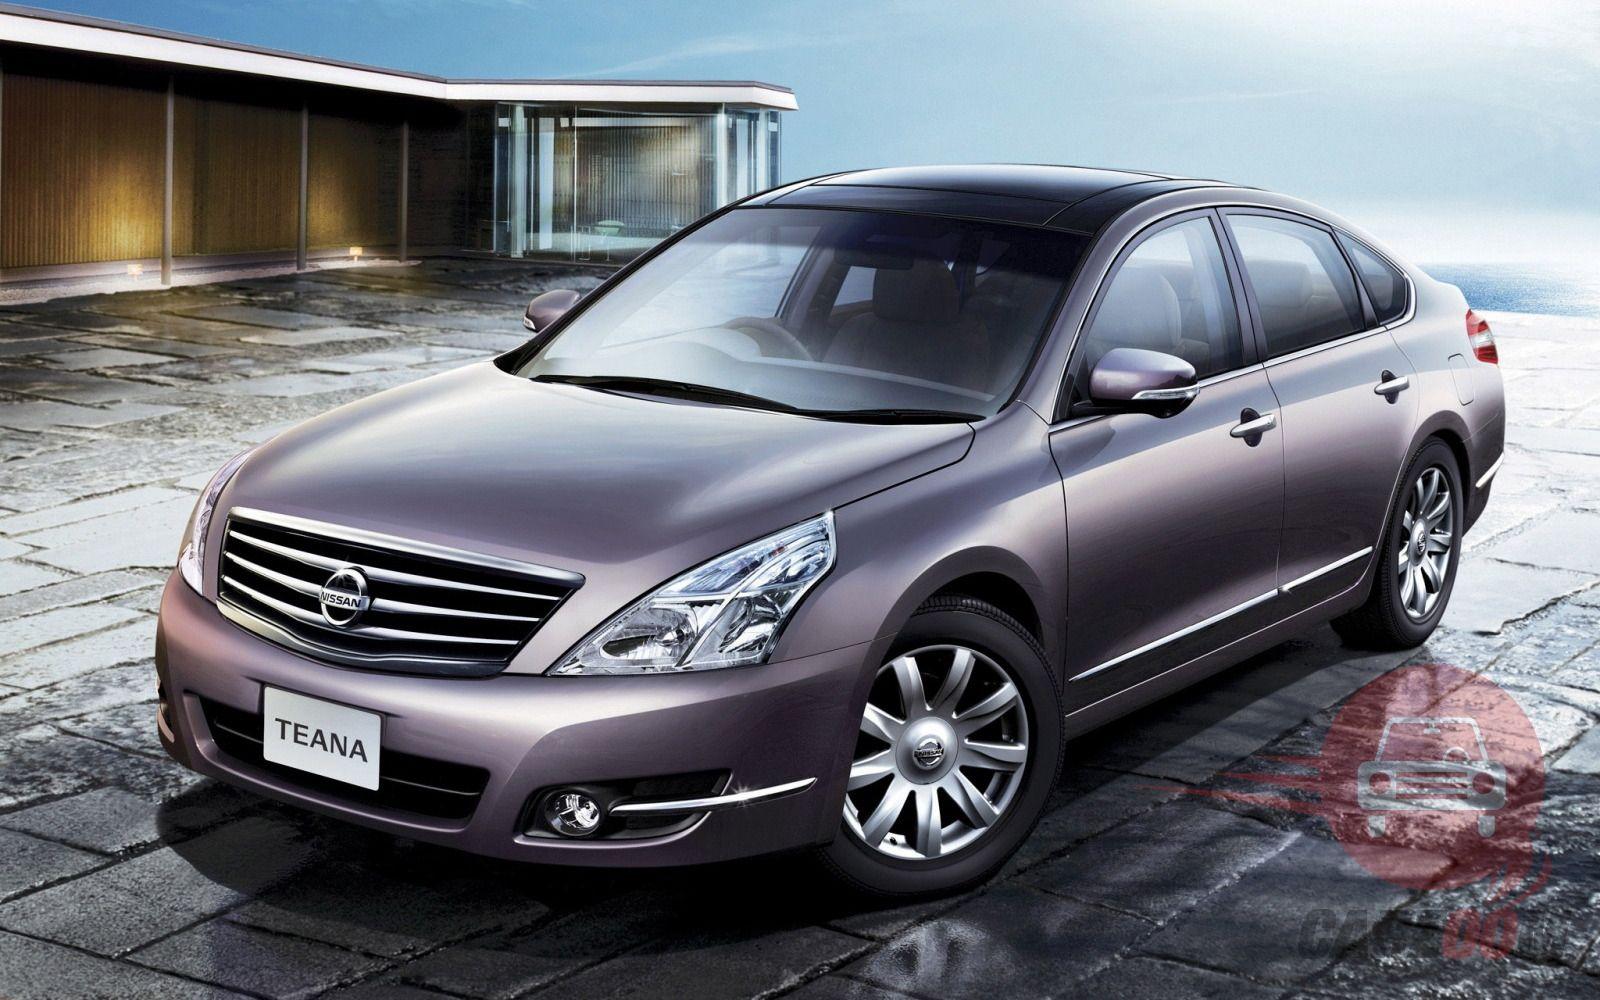 Nissan Teana Exteriors Overall